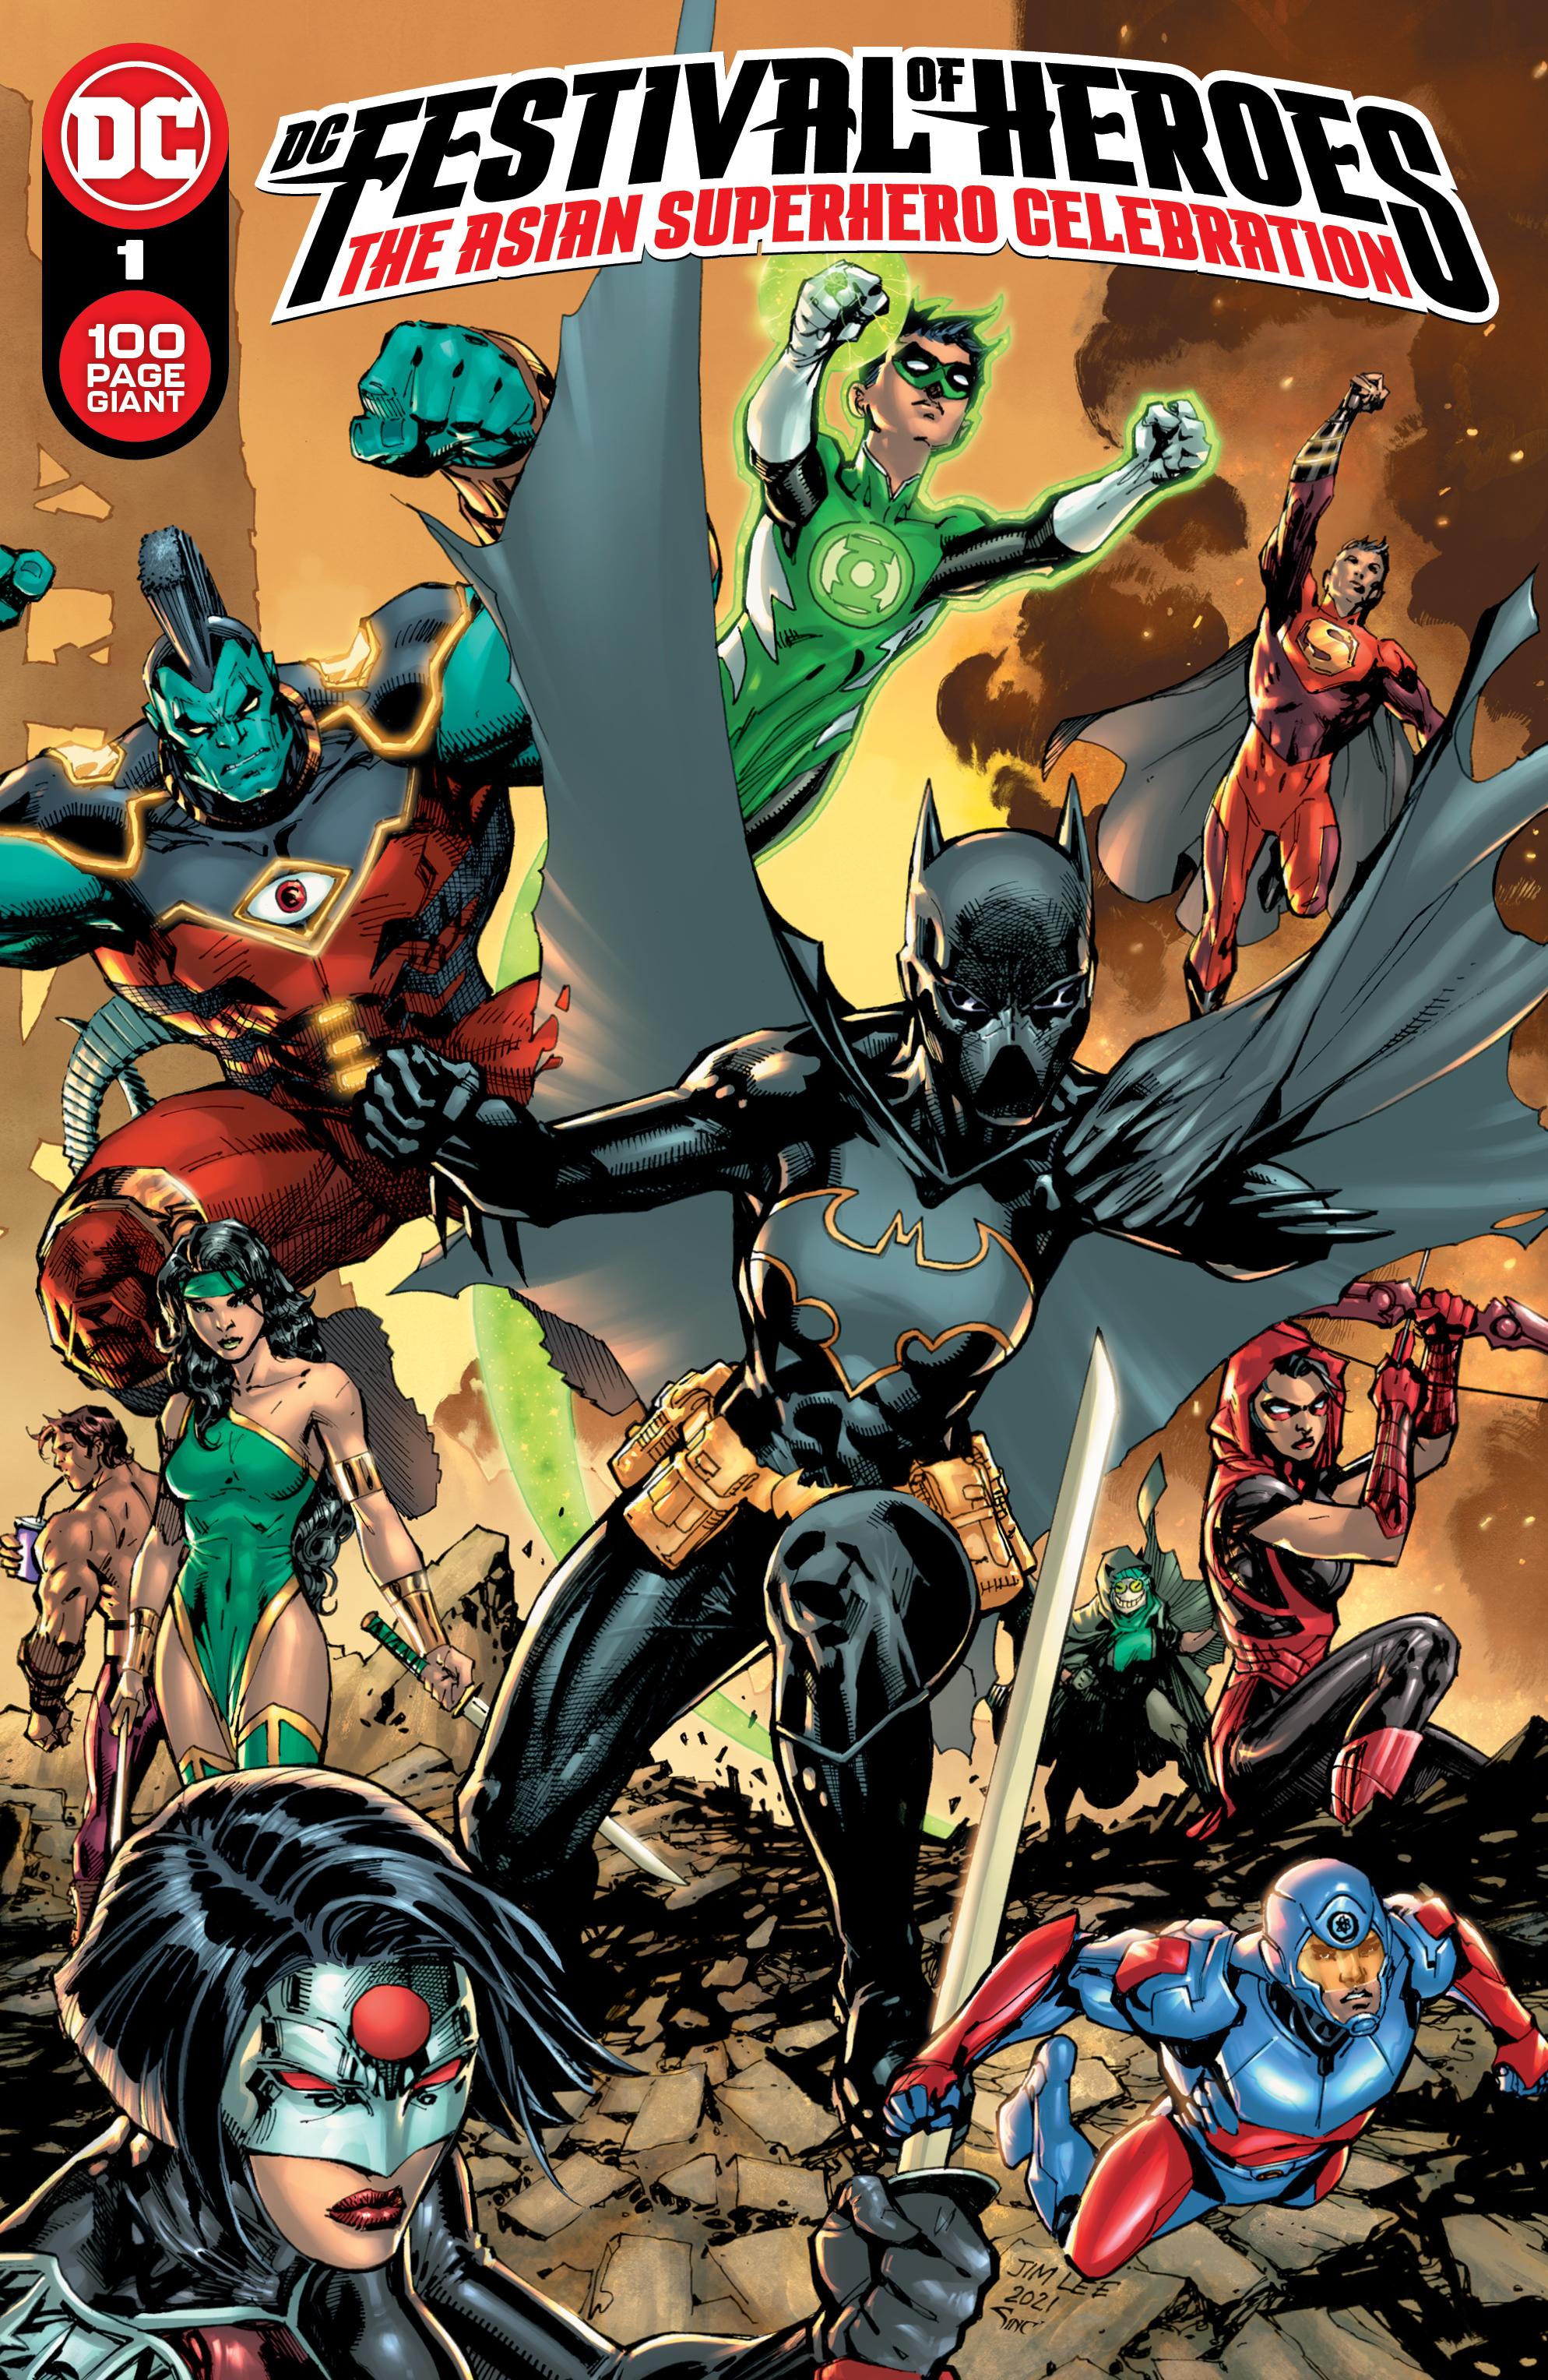 DC Festival of Heroes: The Asian Superhero Celebration - graphic image